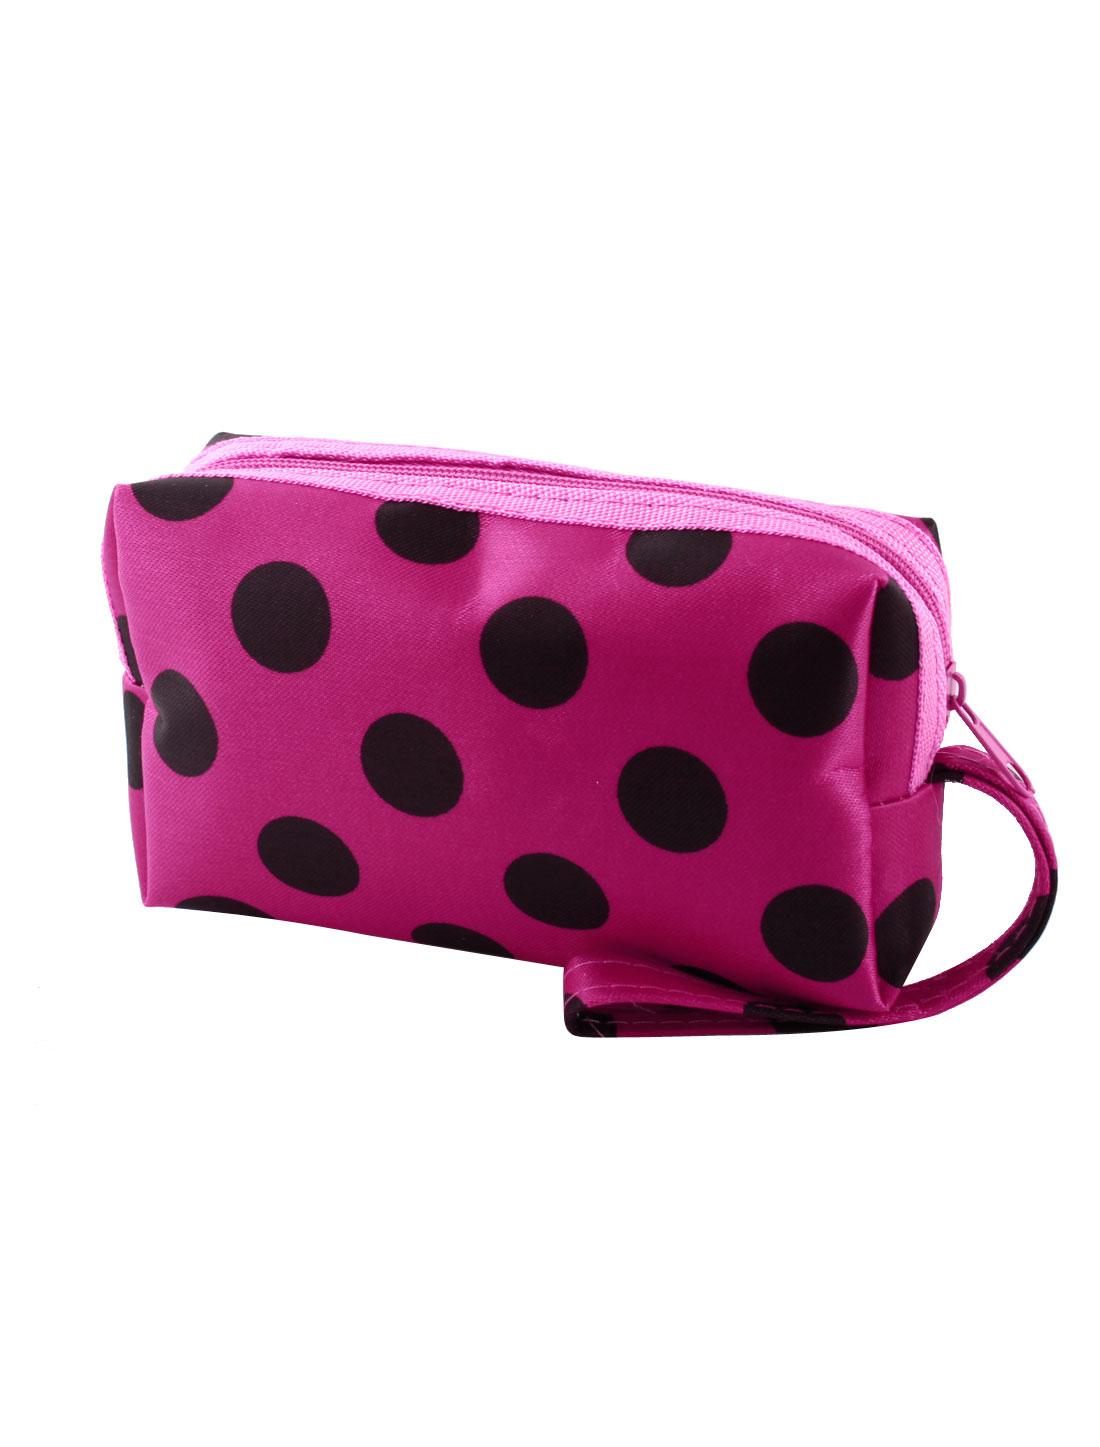 Black Dotted Pattern Zipper Closuer Wallet Change Pouch Purse Fuchsia